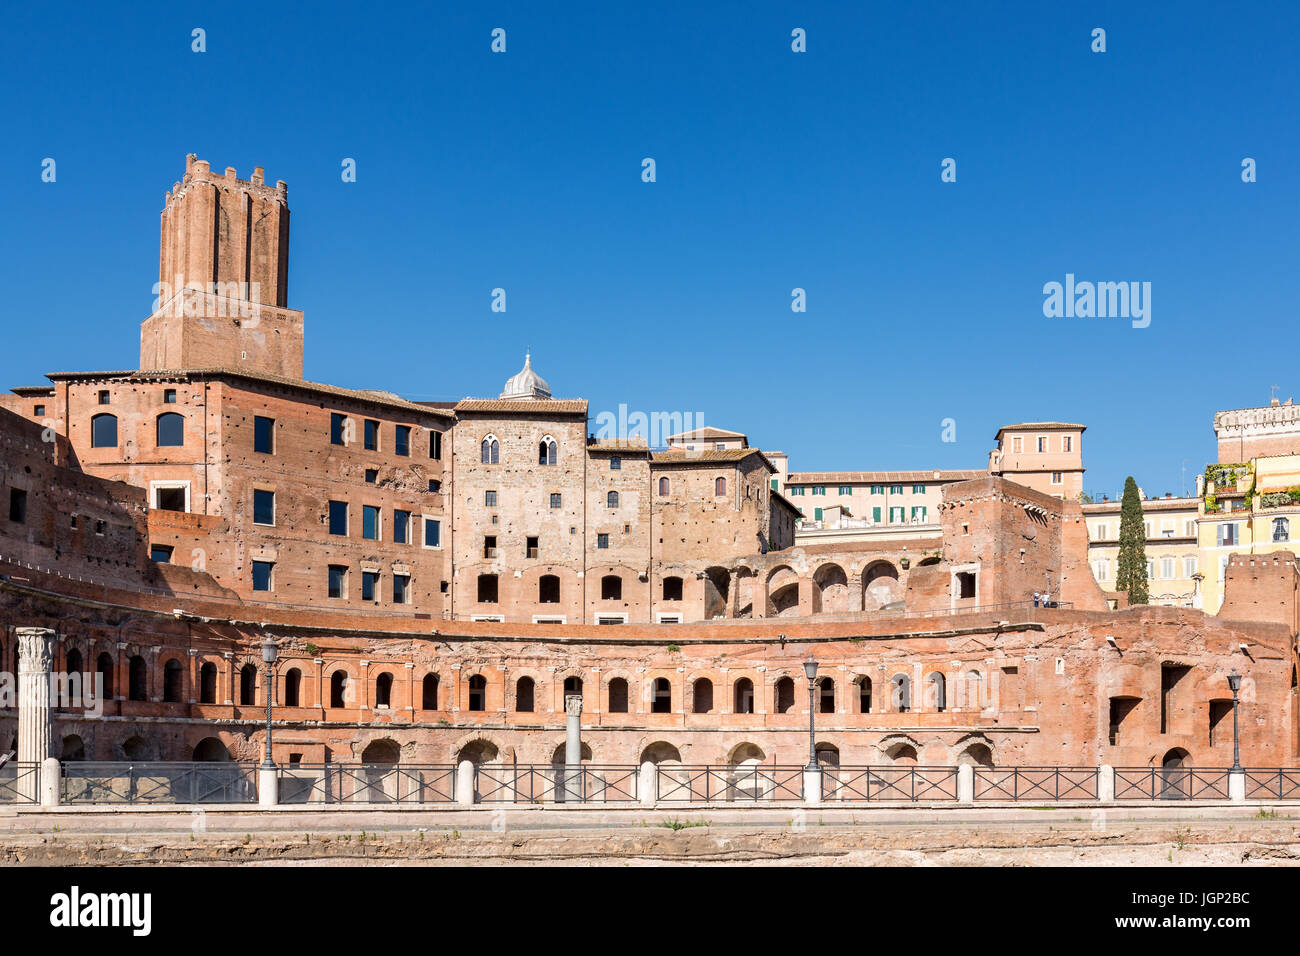 Archbasilica Saint-Jean de Latran (Arcibasilica Papale di San Giovanni in Laterano), Rome, Latium, Italie Banque D'Images